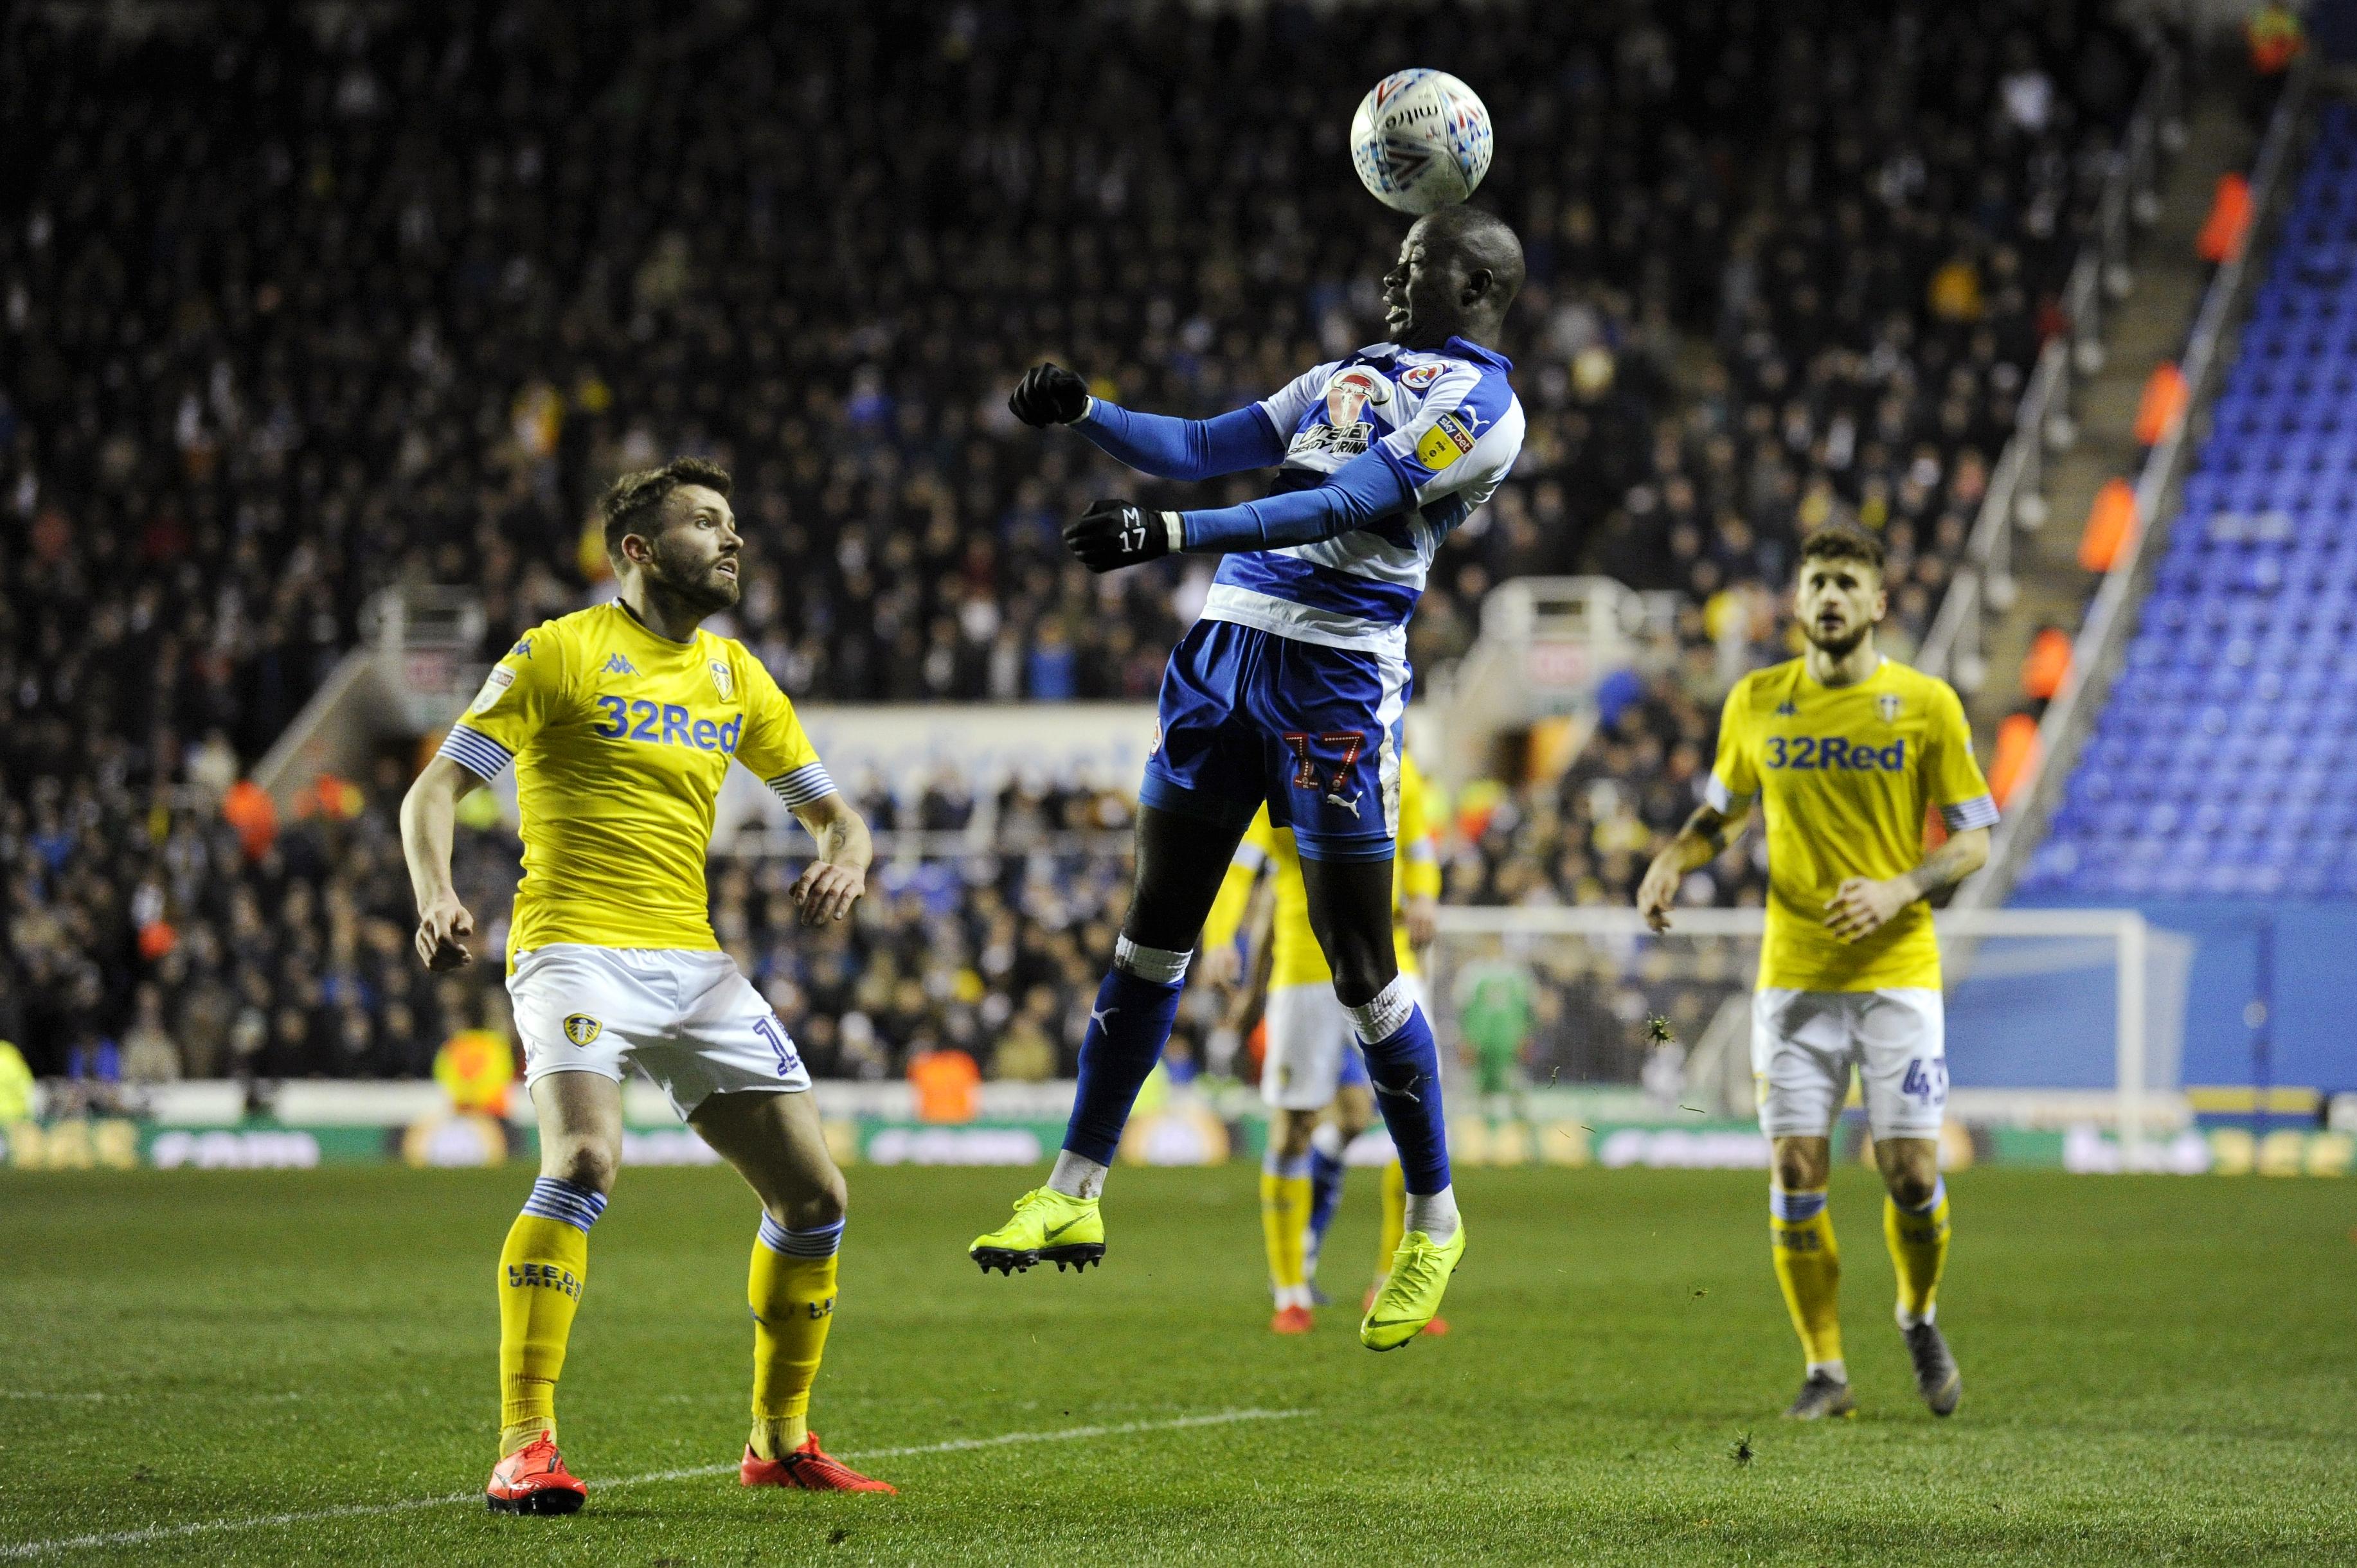 Reading v Leeds United - Sky Bet Championship